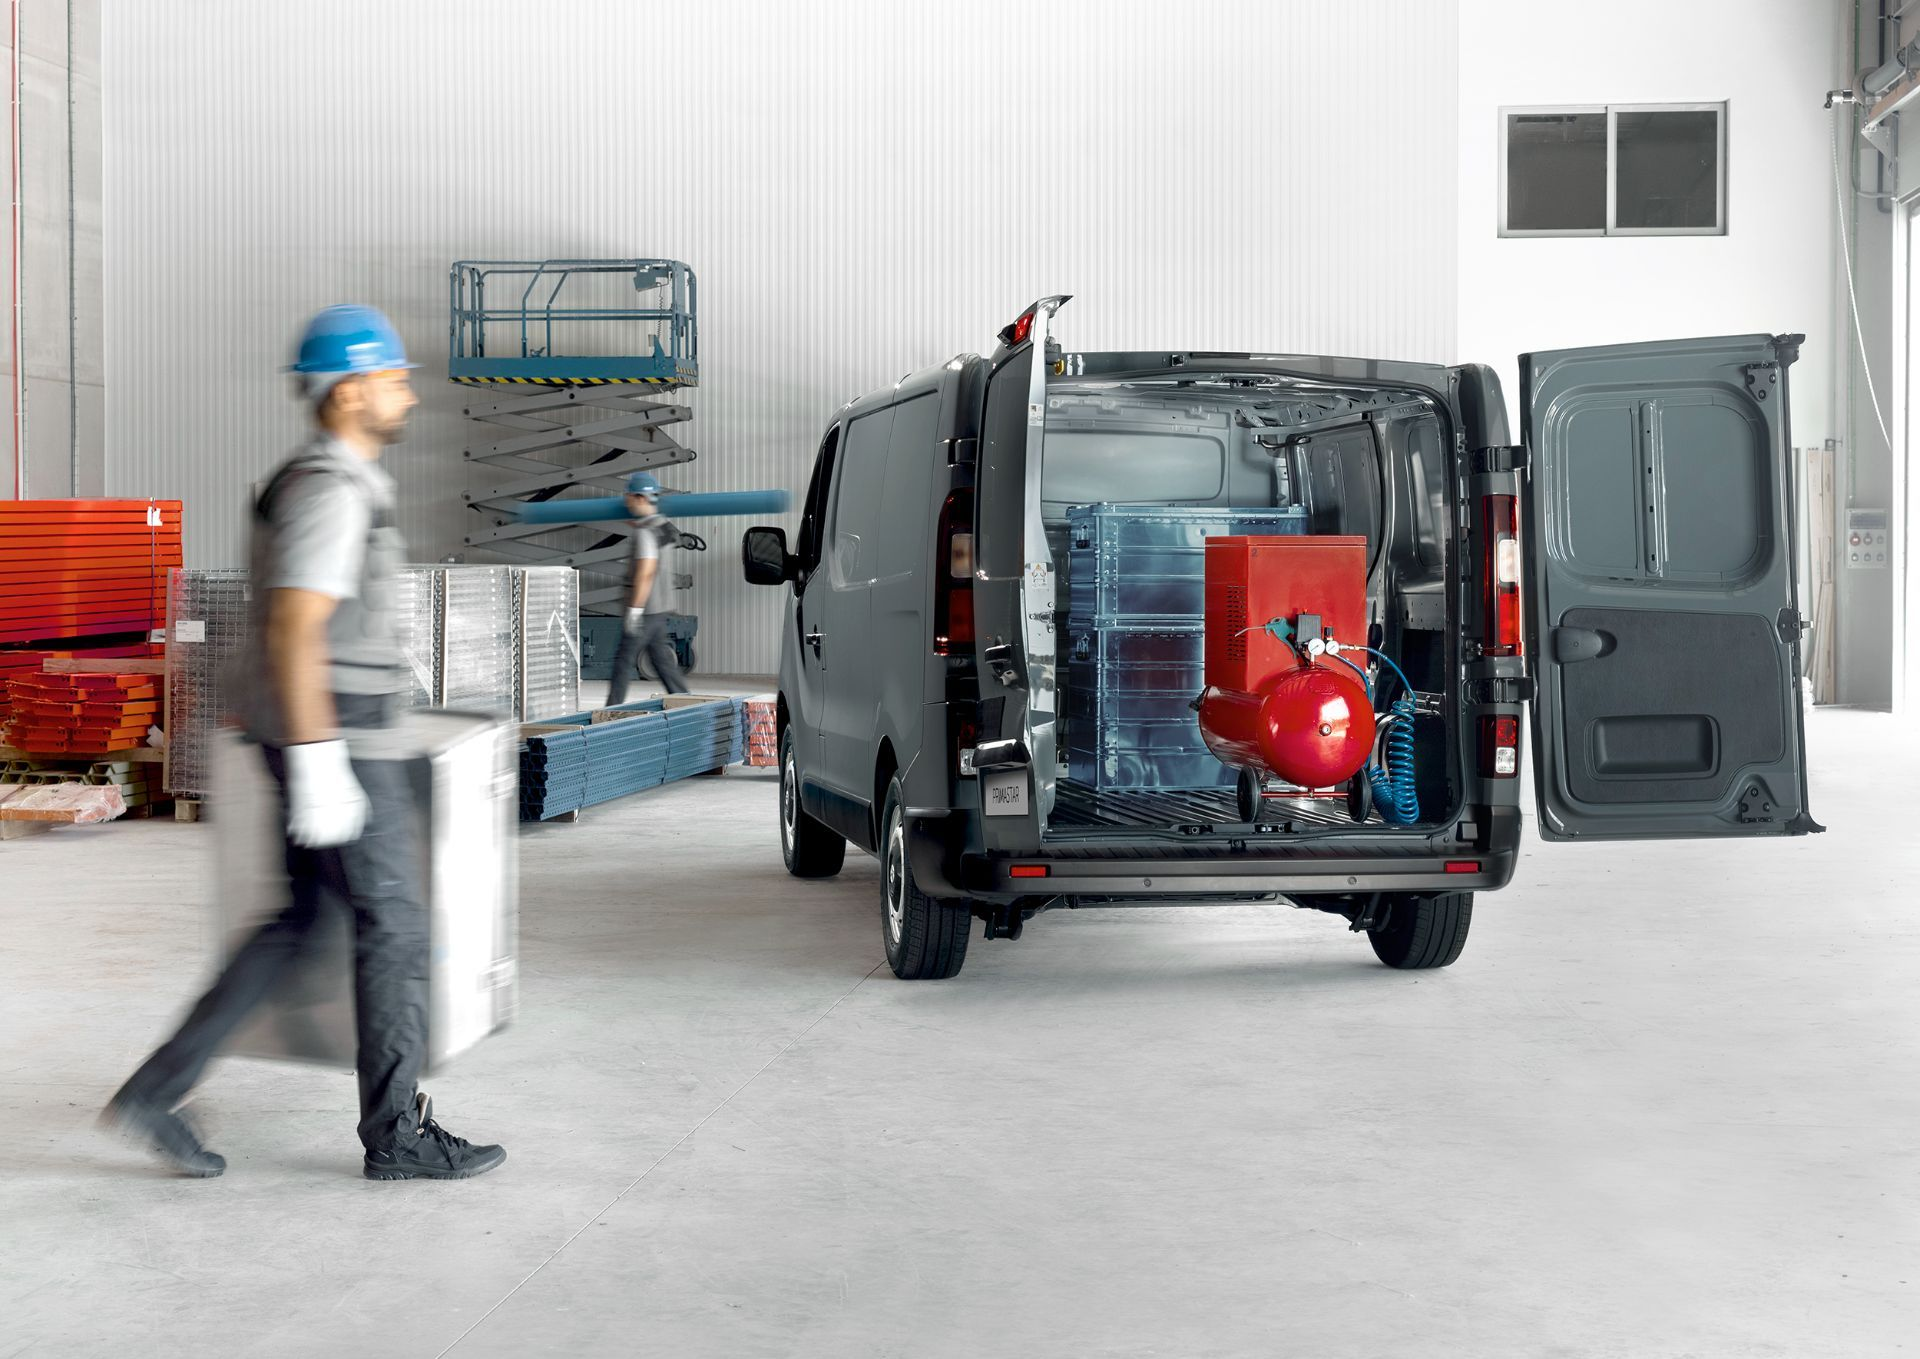 2022-Nissan-Primastar-Van-7-1